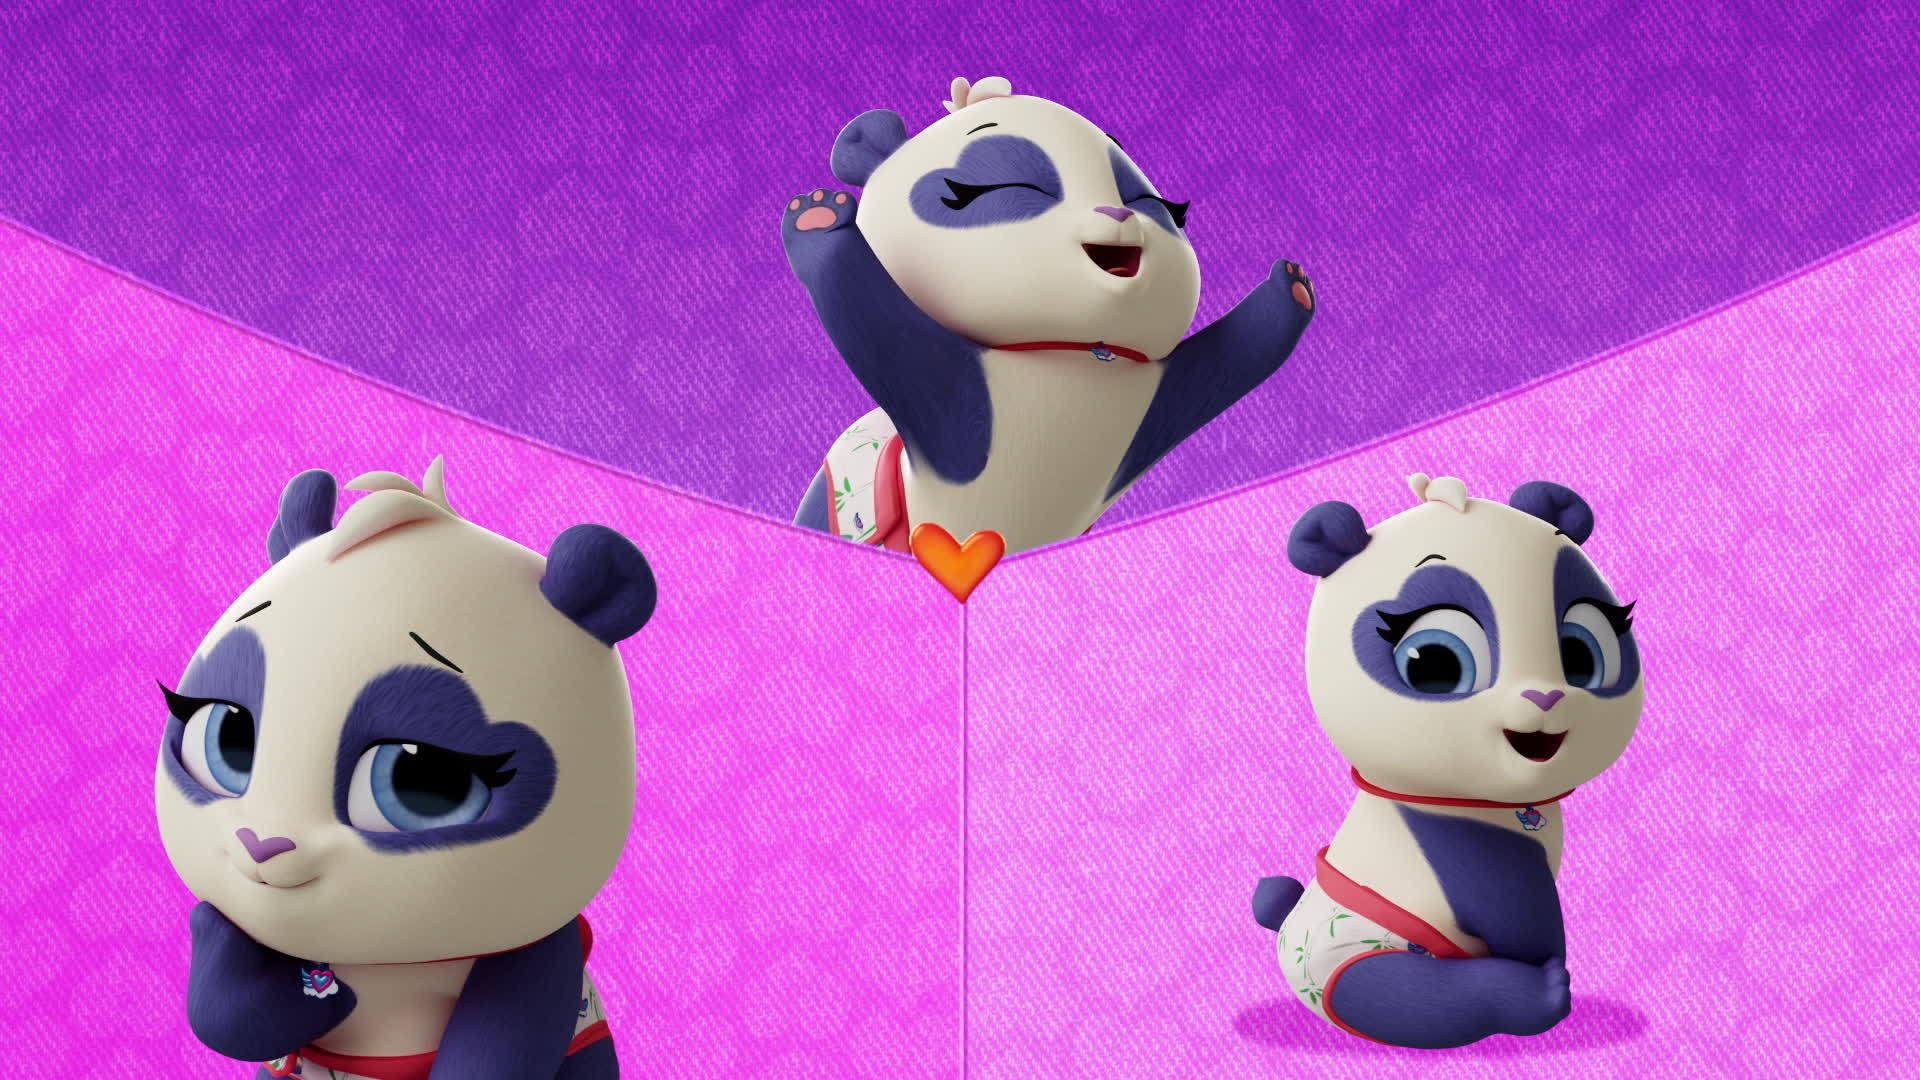 Precious The Panda